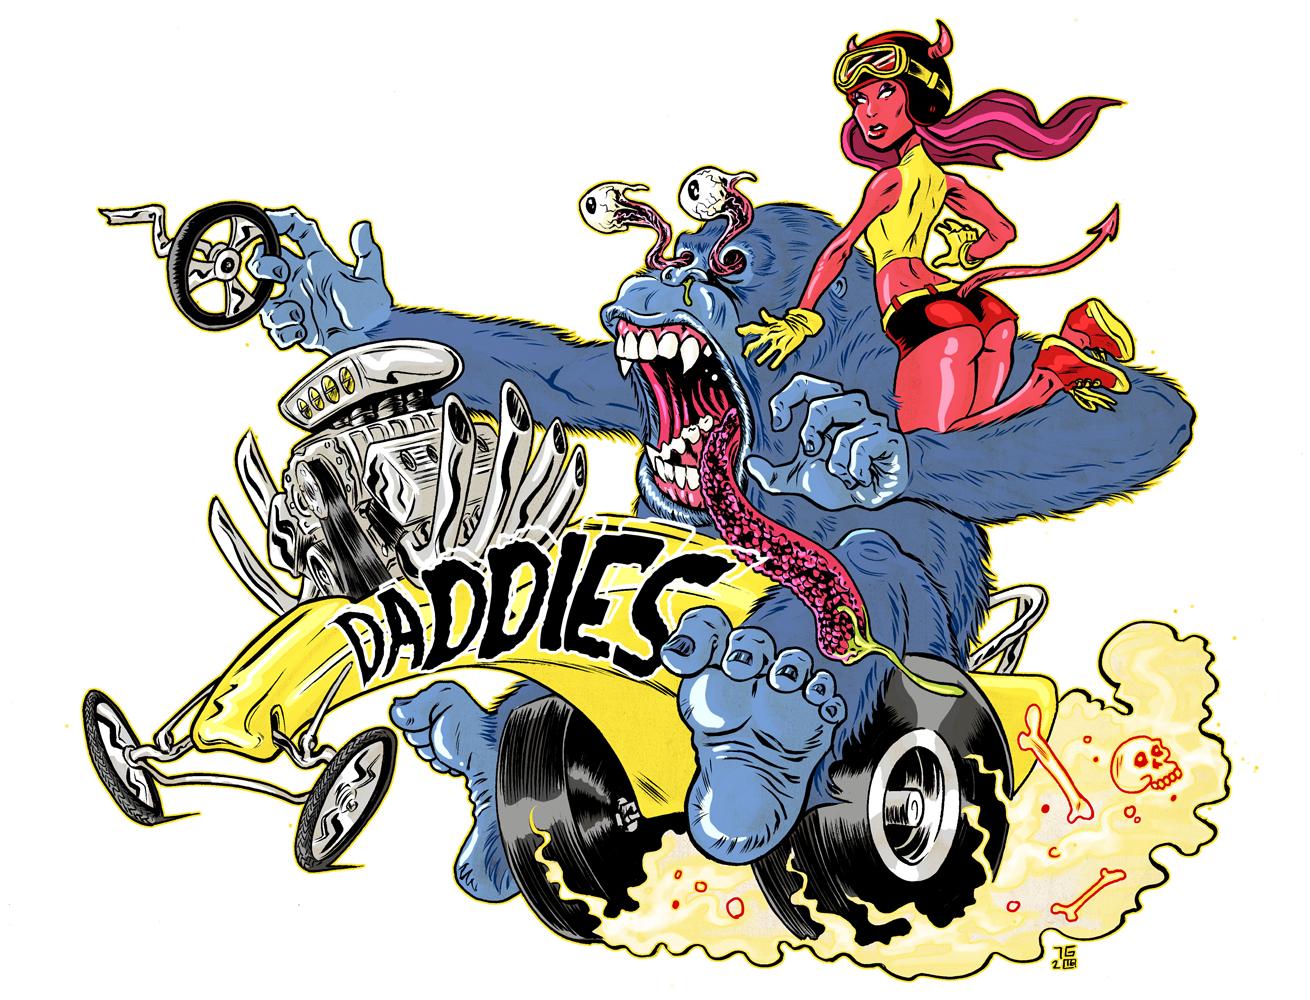 Daddies April design.jpeg